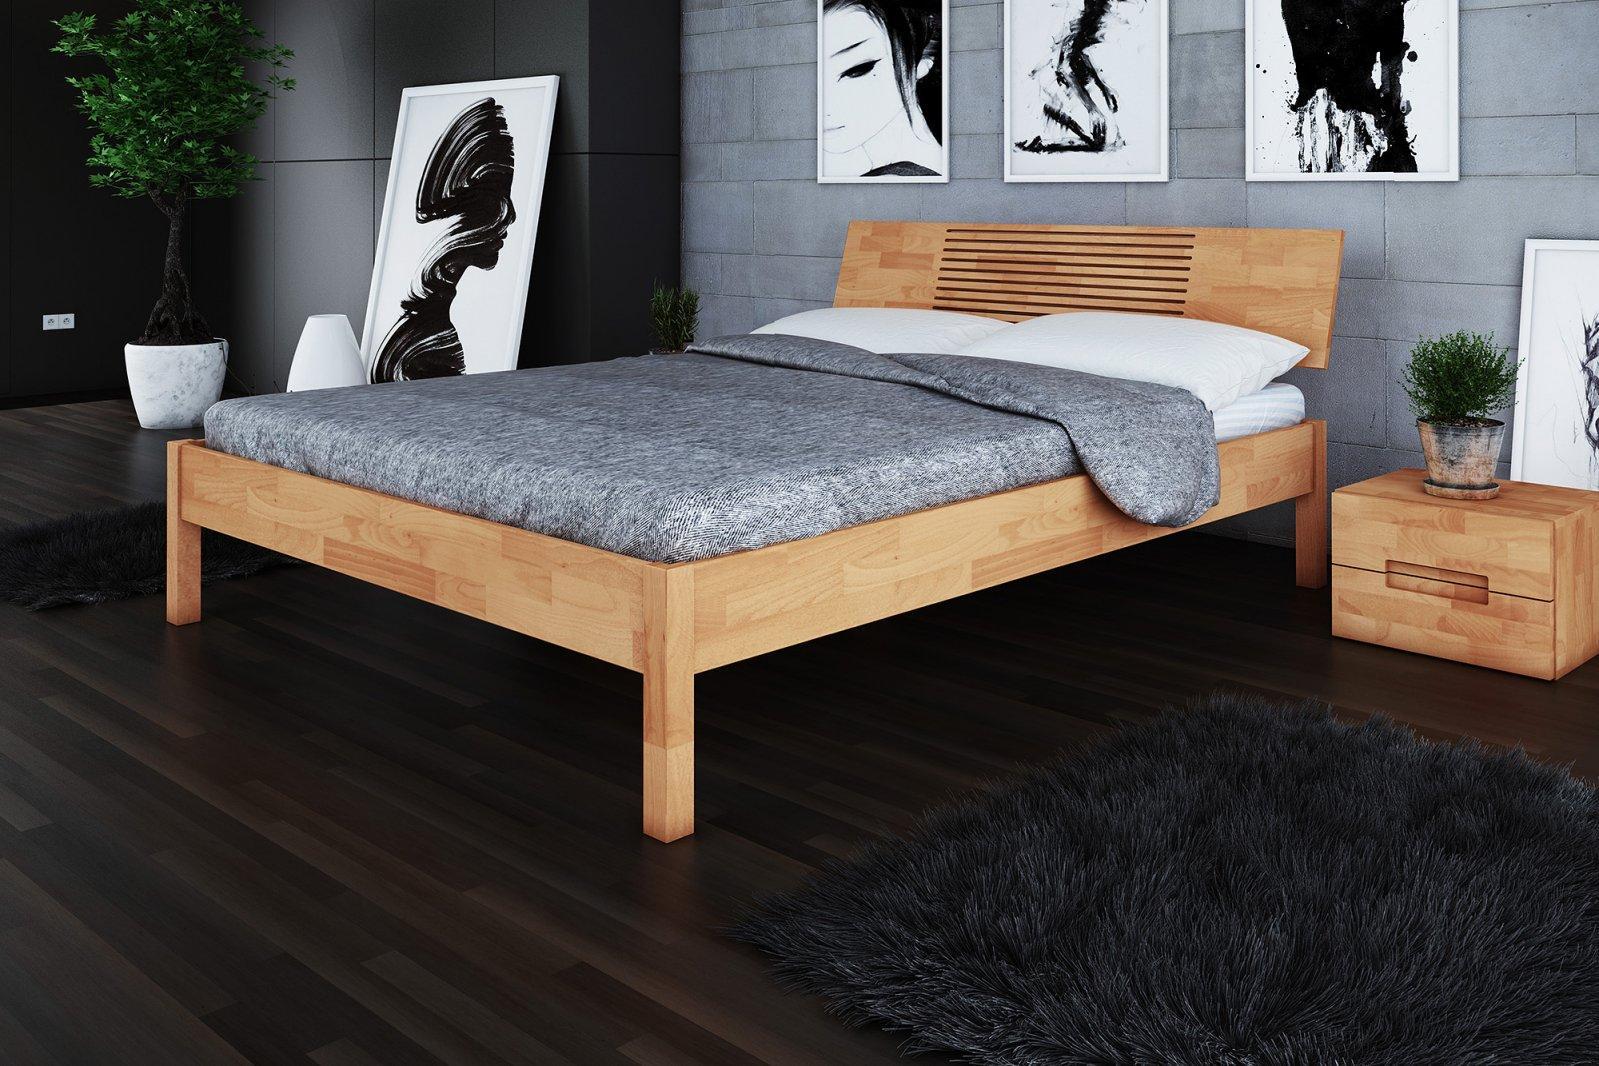 Bed VENTO A